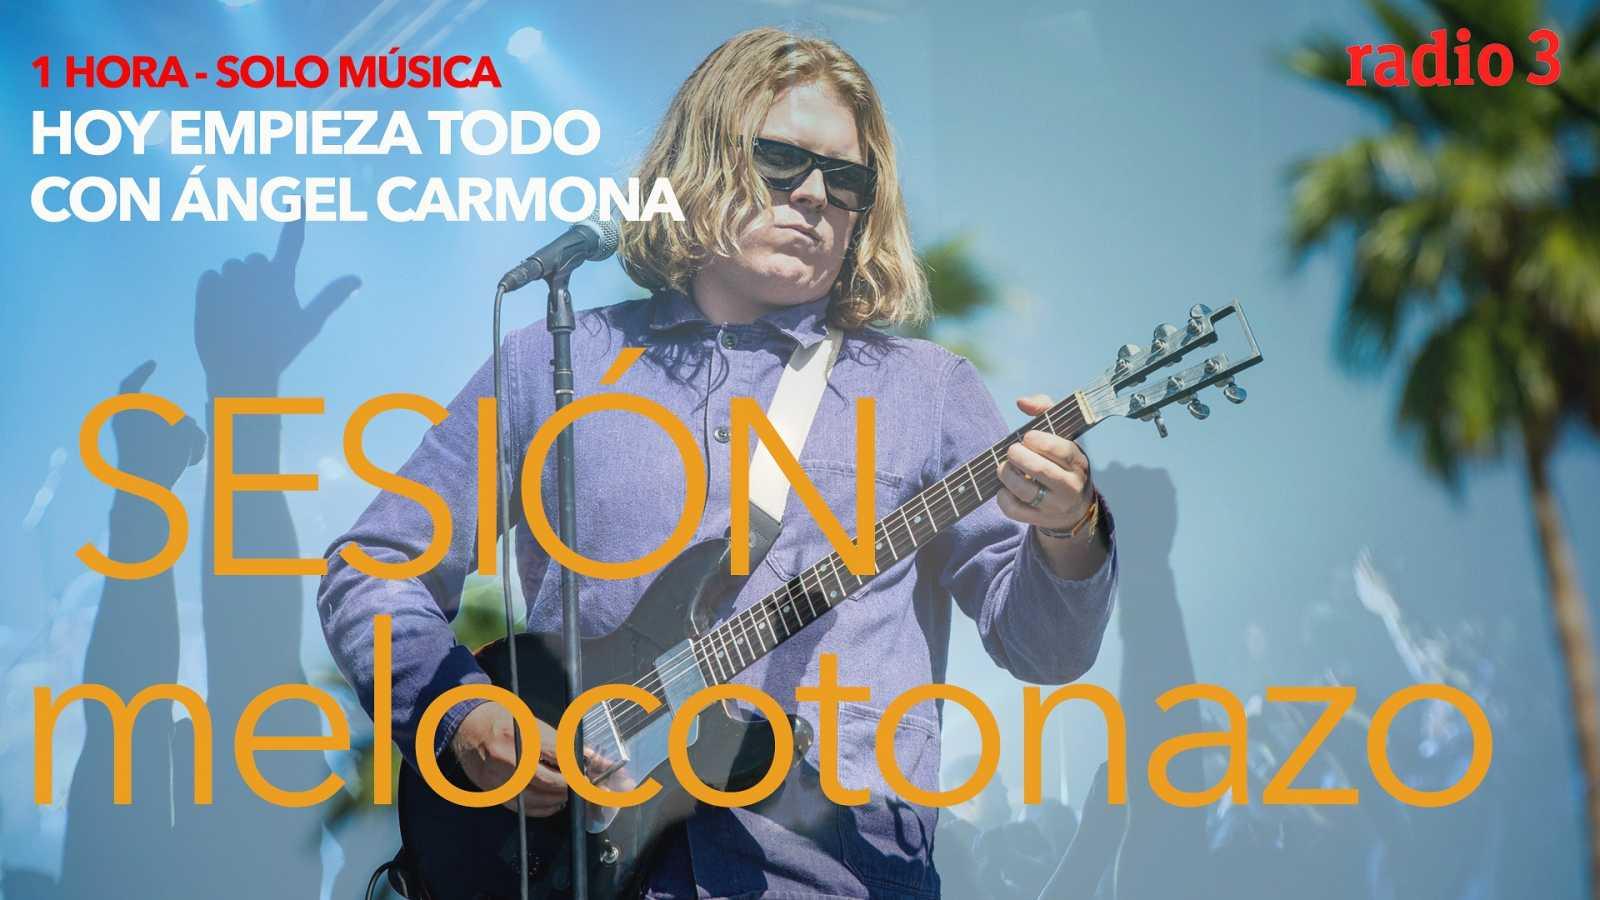 Hoy empieza todo con Ángel Carmona - #SesiónMelocotonazo: Moris, Ty Segall, Ed Sheeran... - 19/11/20 - escuchar ahora